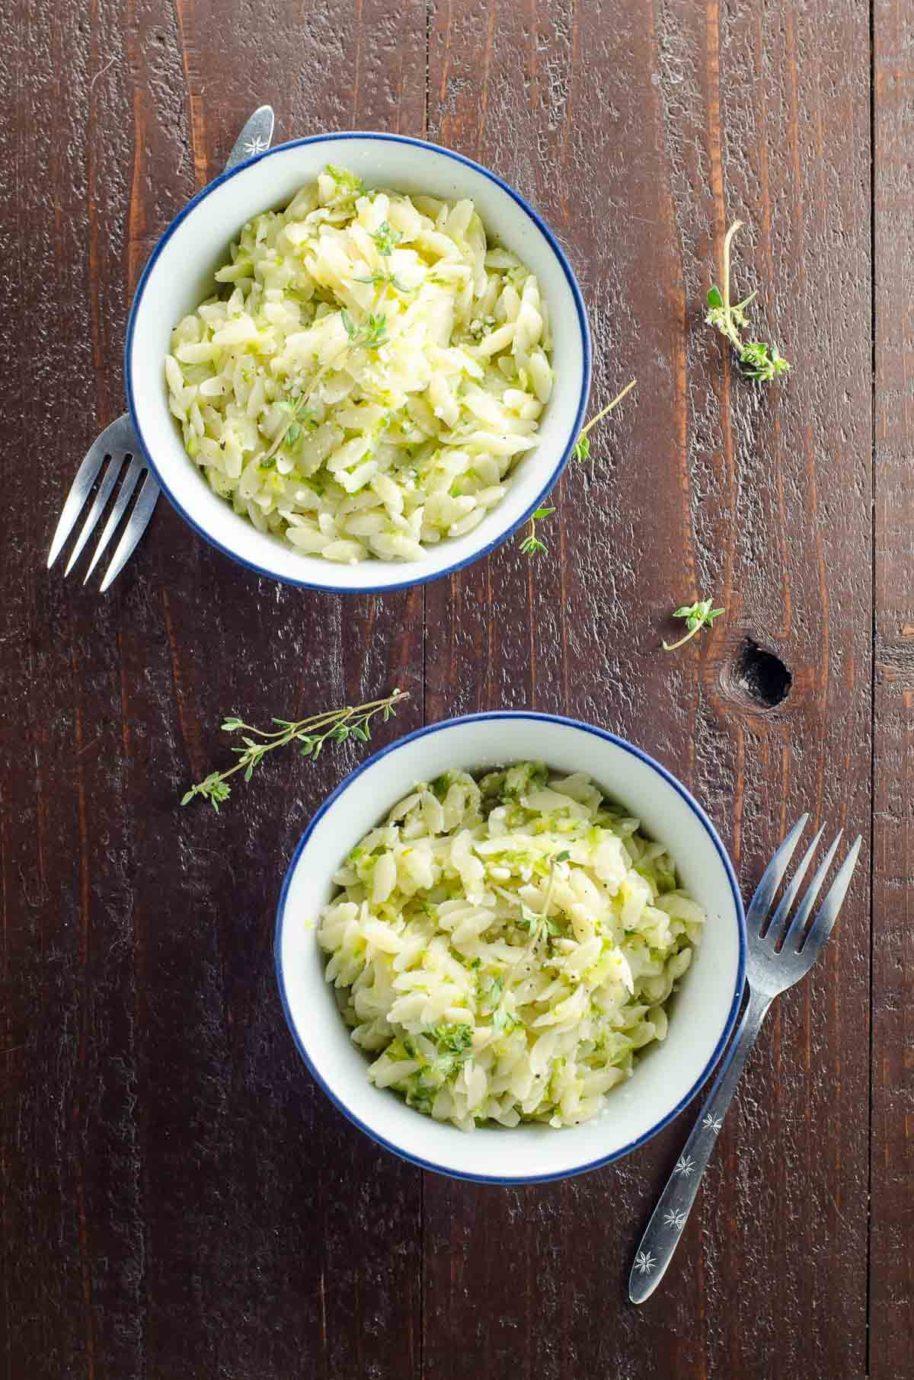 zucchini orzo in bowls